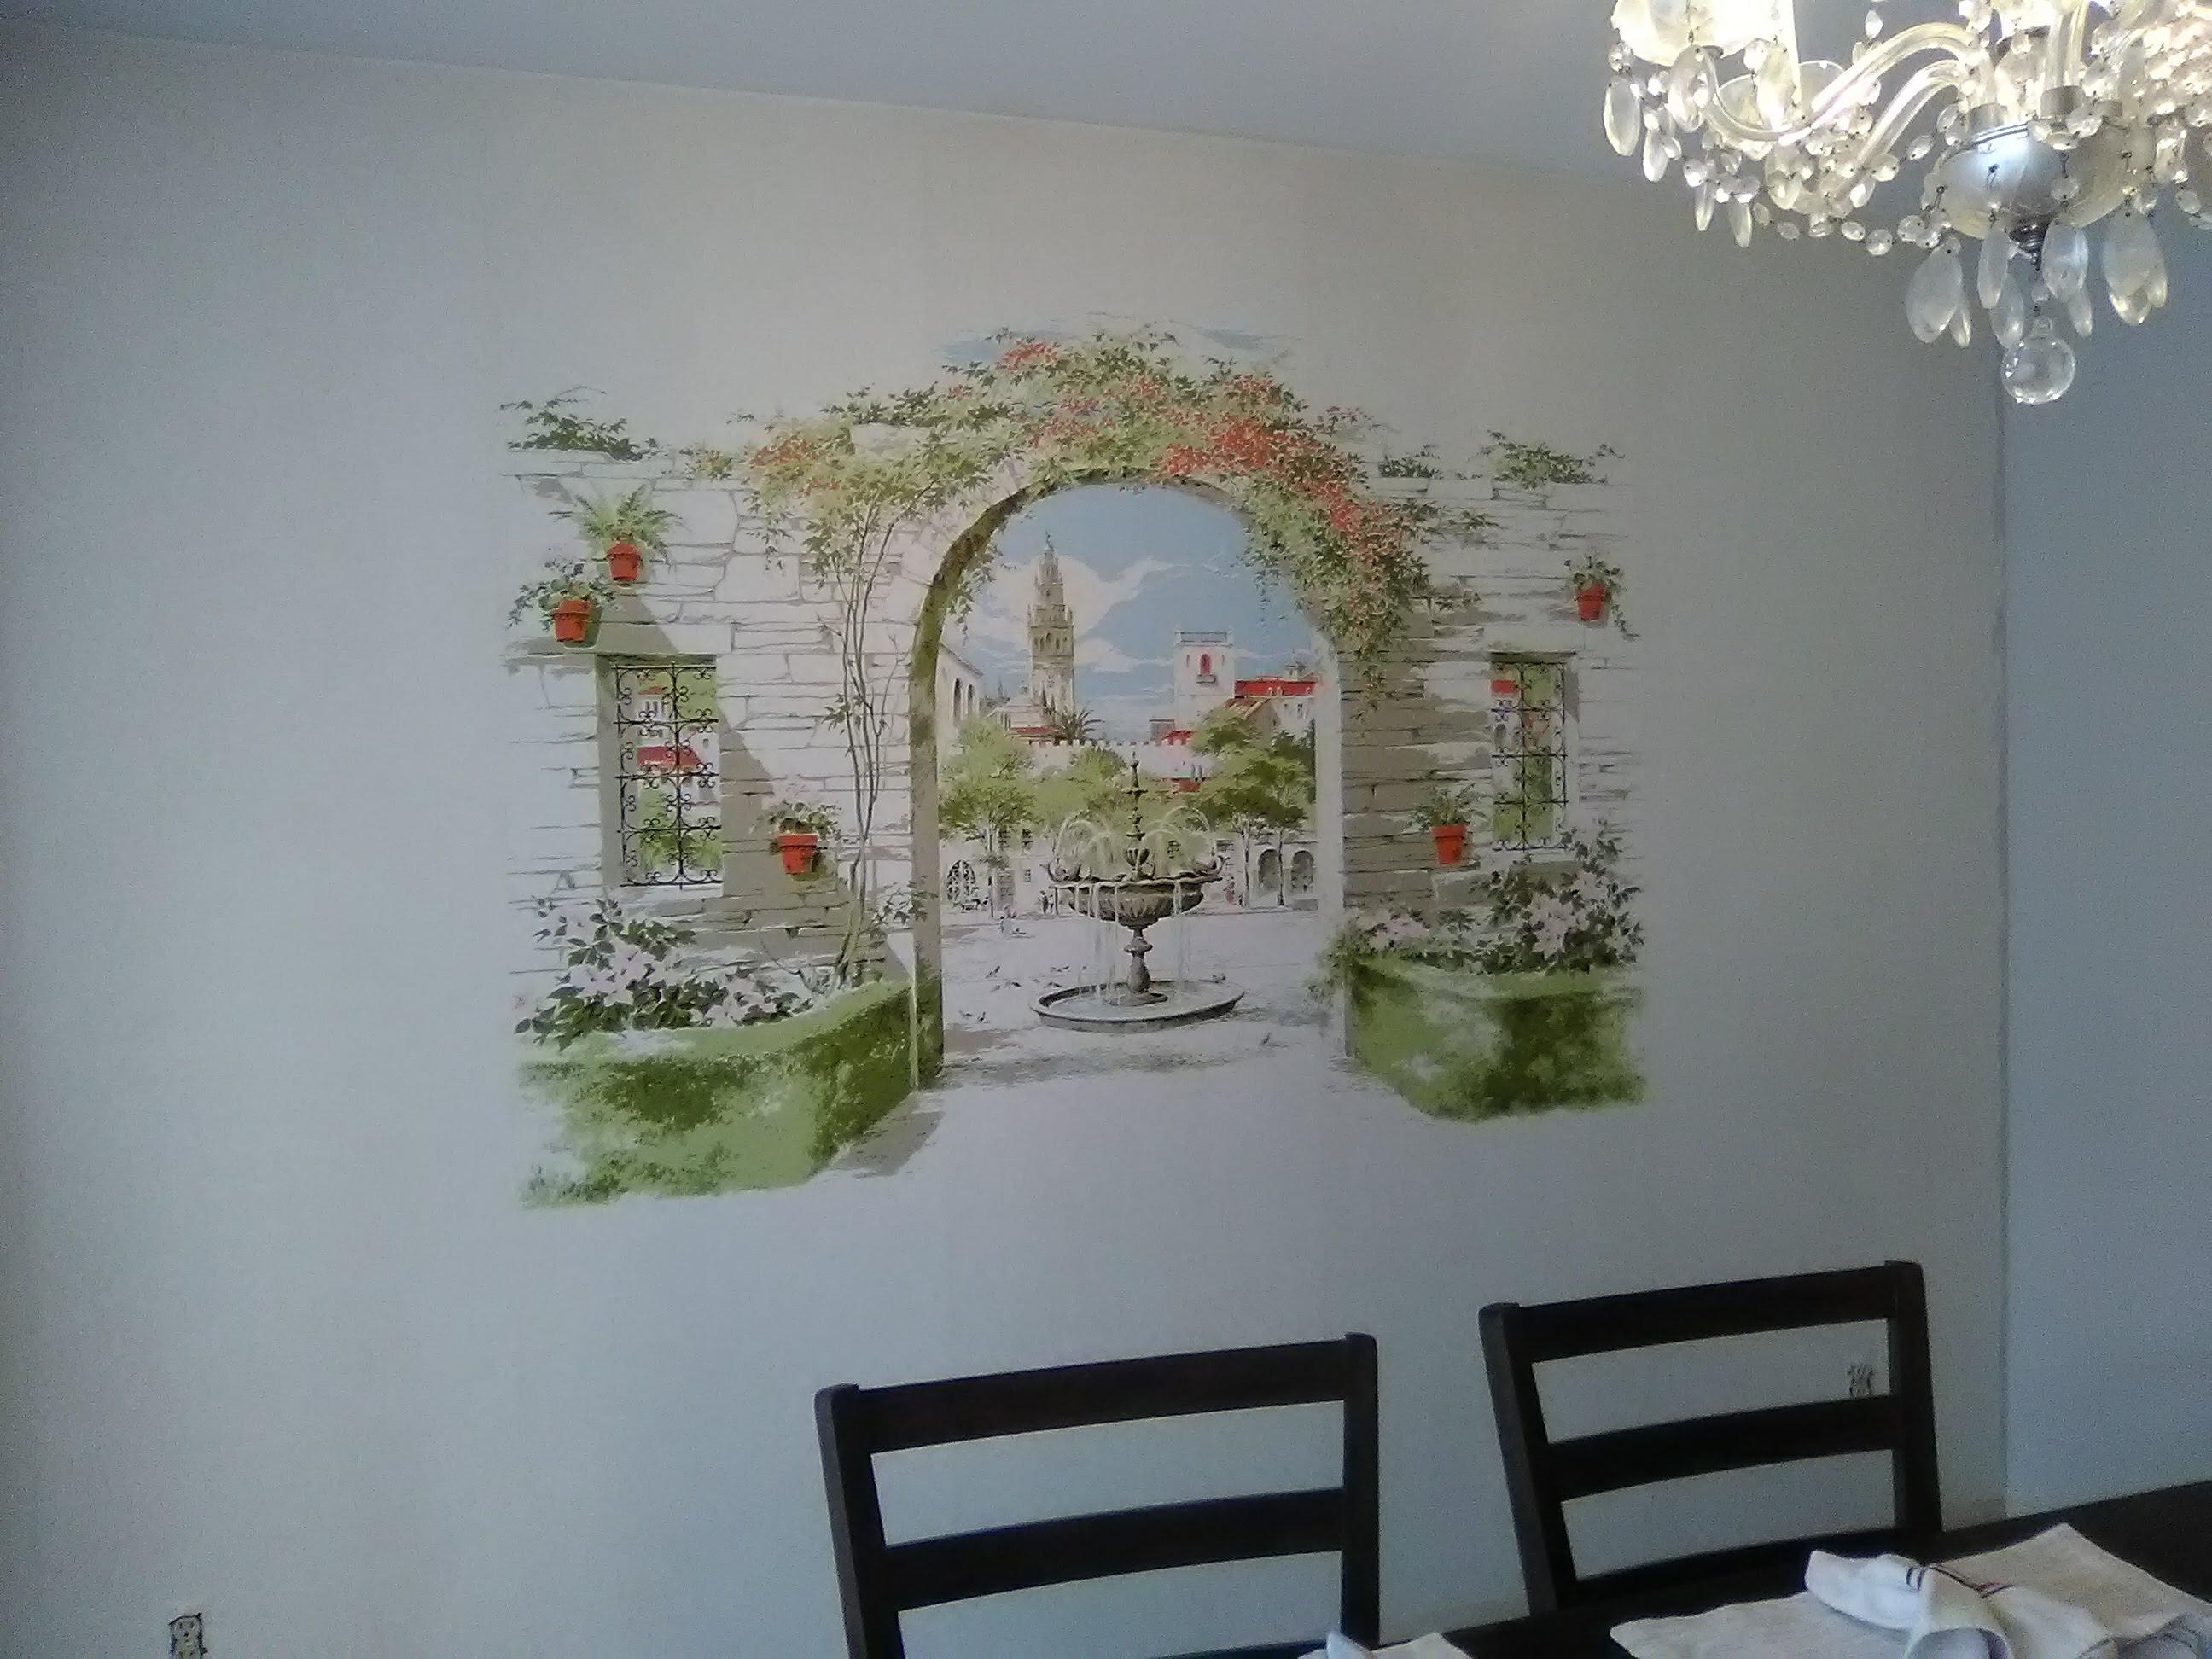 august 2018 wallpaperlady\u0027s blogwallpaper mural 60s fountain distant jpg